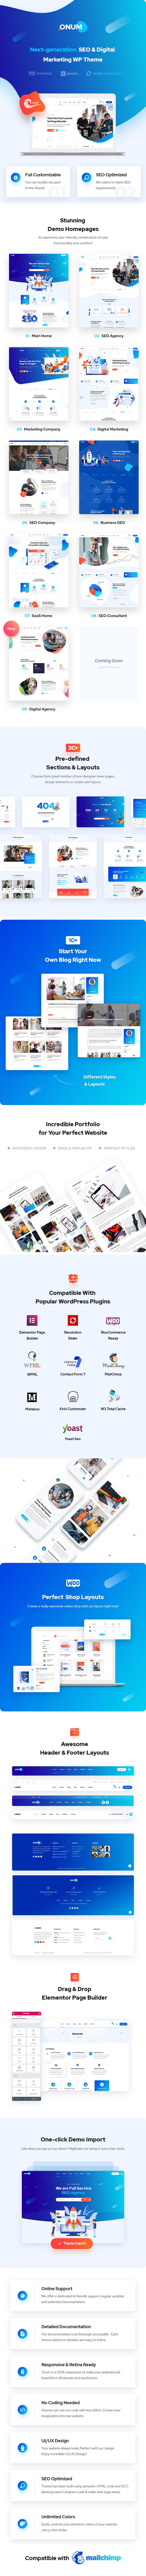 Onum v1.2.0.7-SEO/网络营销服务公司WordPress主题插图4